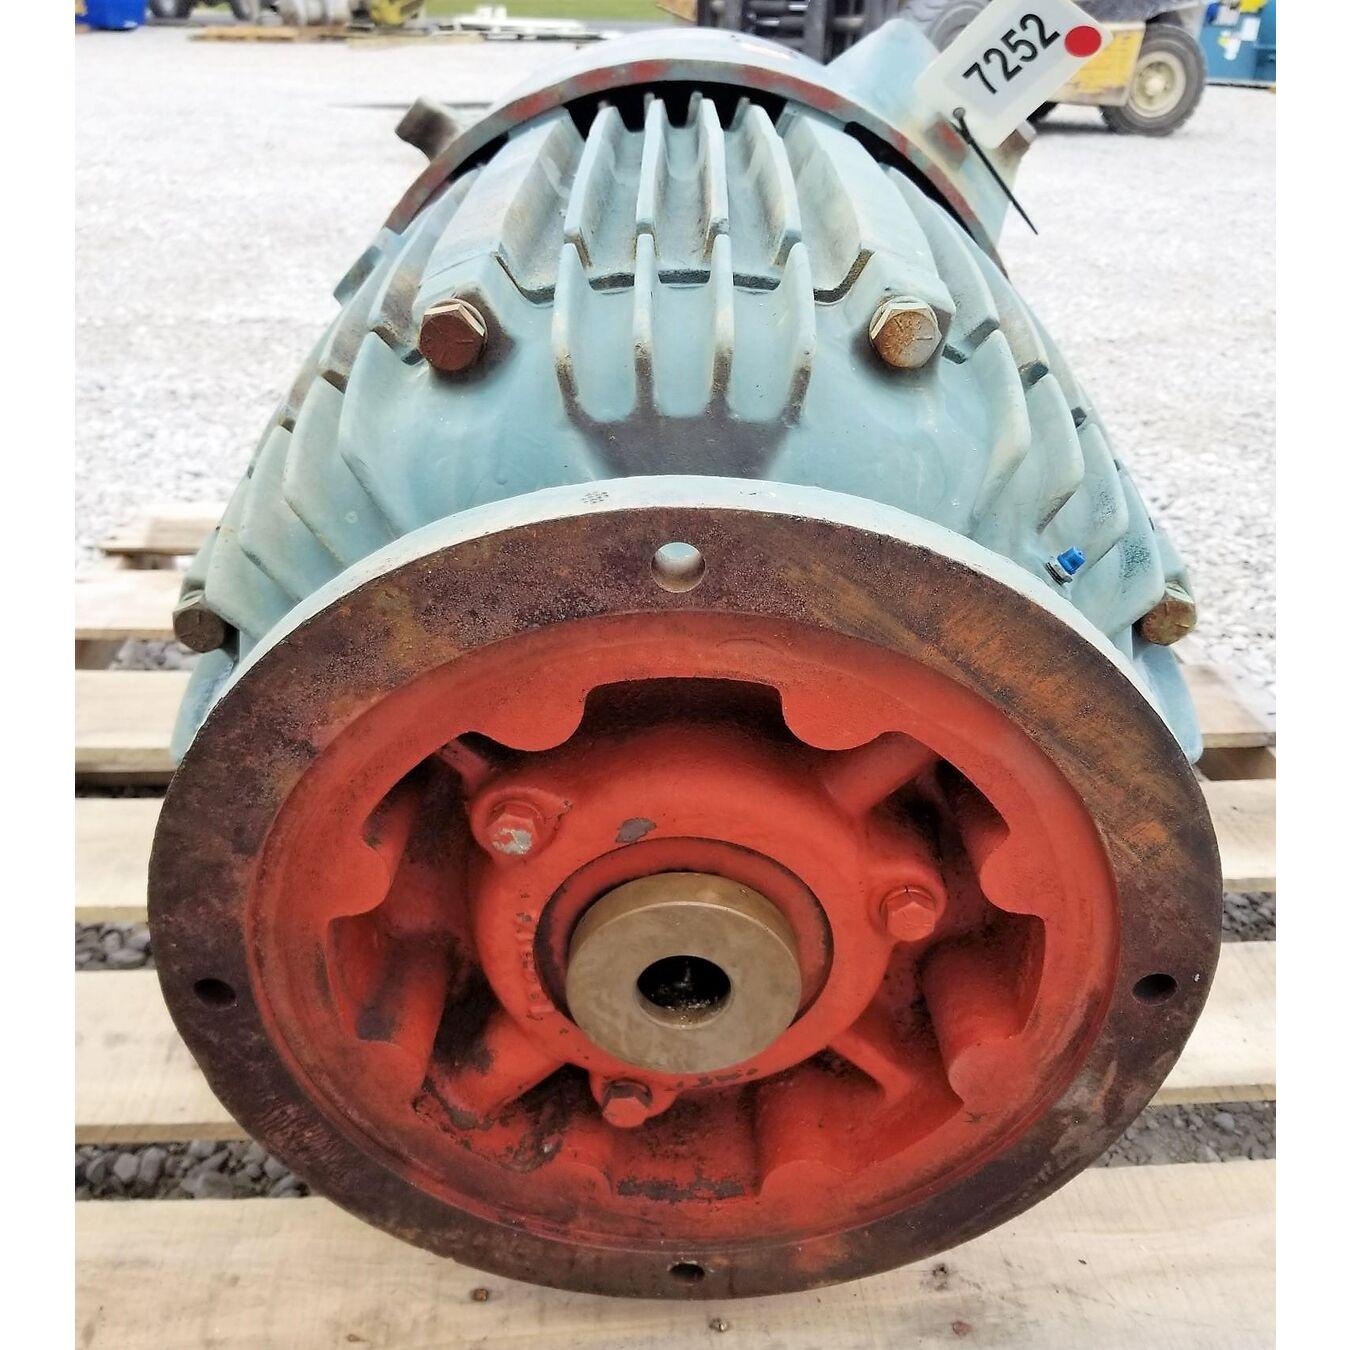 Us electrical motors 100 hp 460 v motor 405tp frame motors drives us electrical motors 100 hp 460 v motor 405tp frame publicscrutiny Image collections